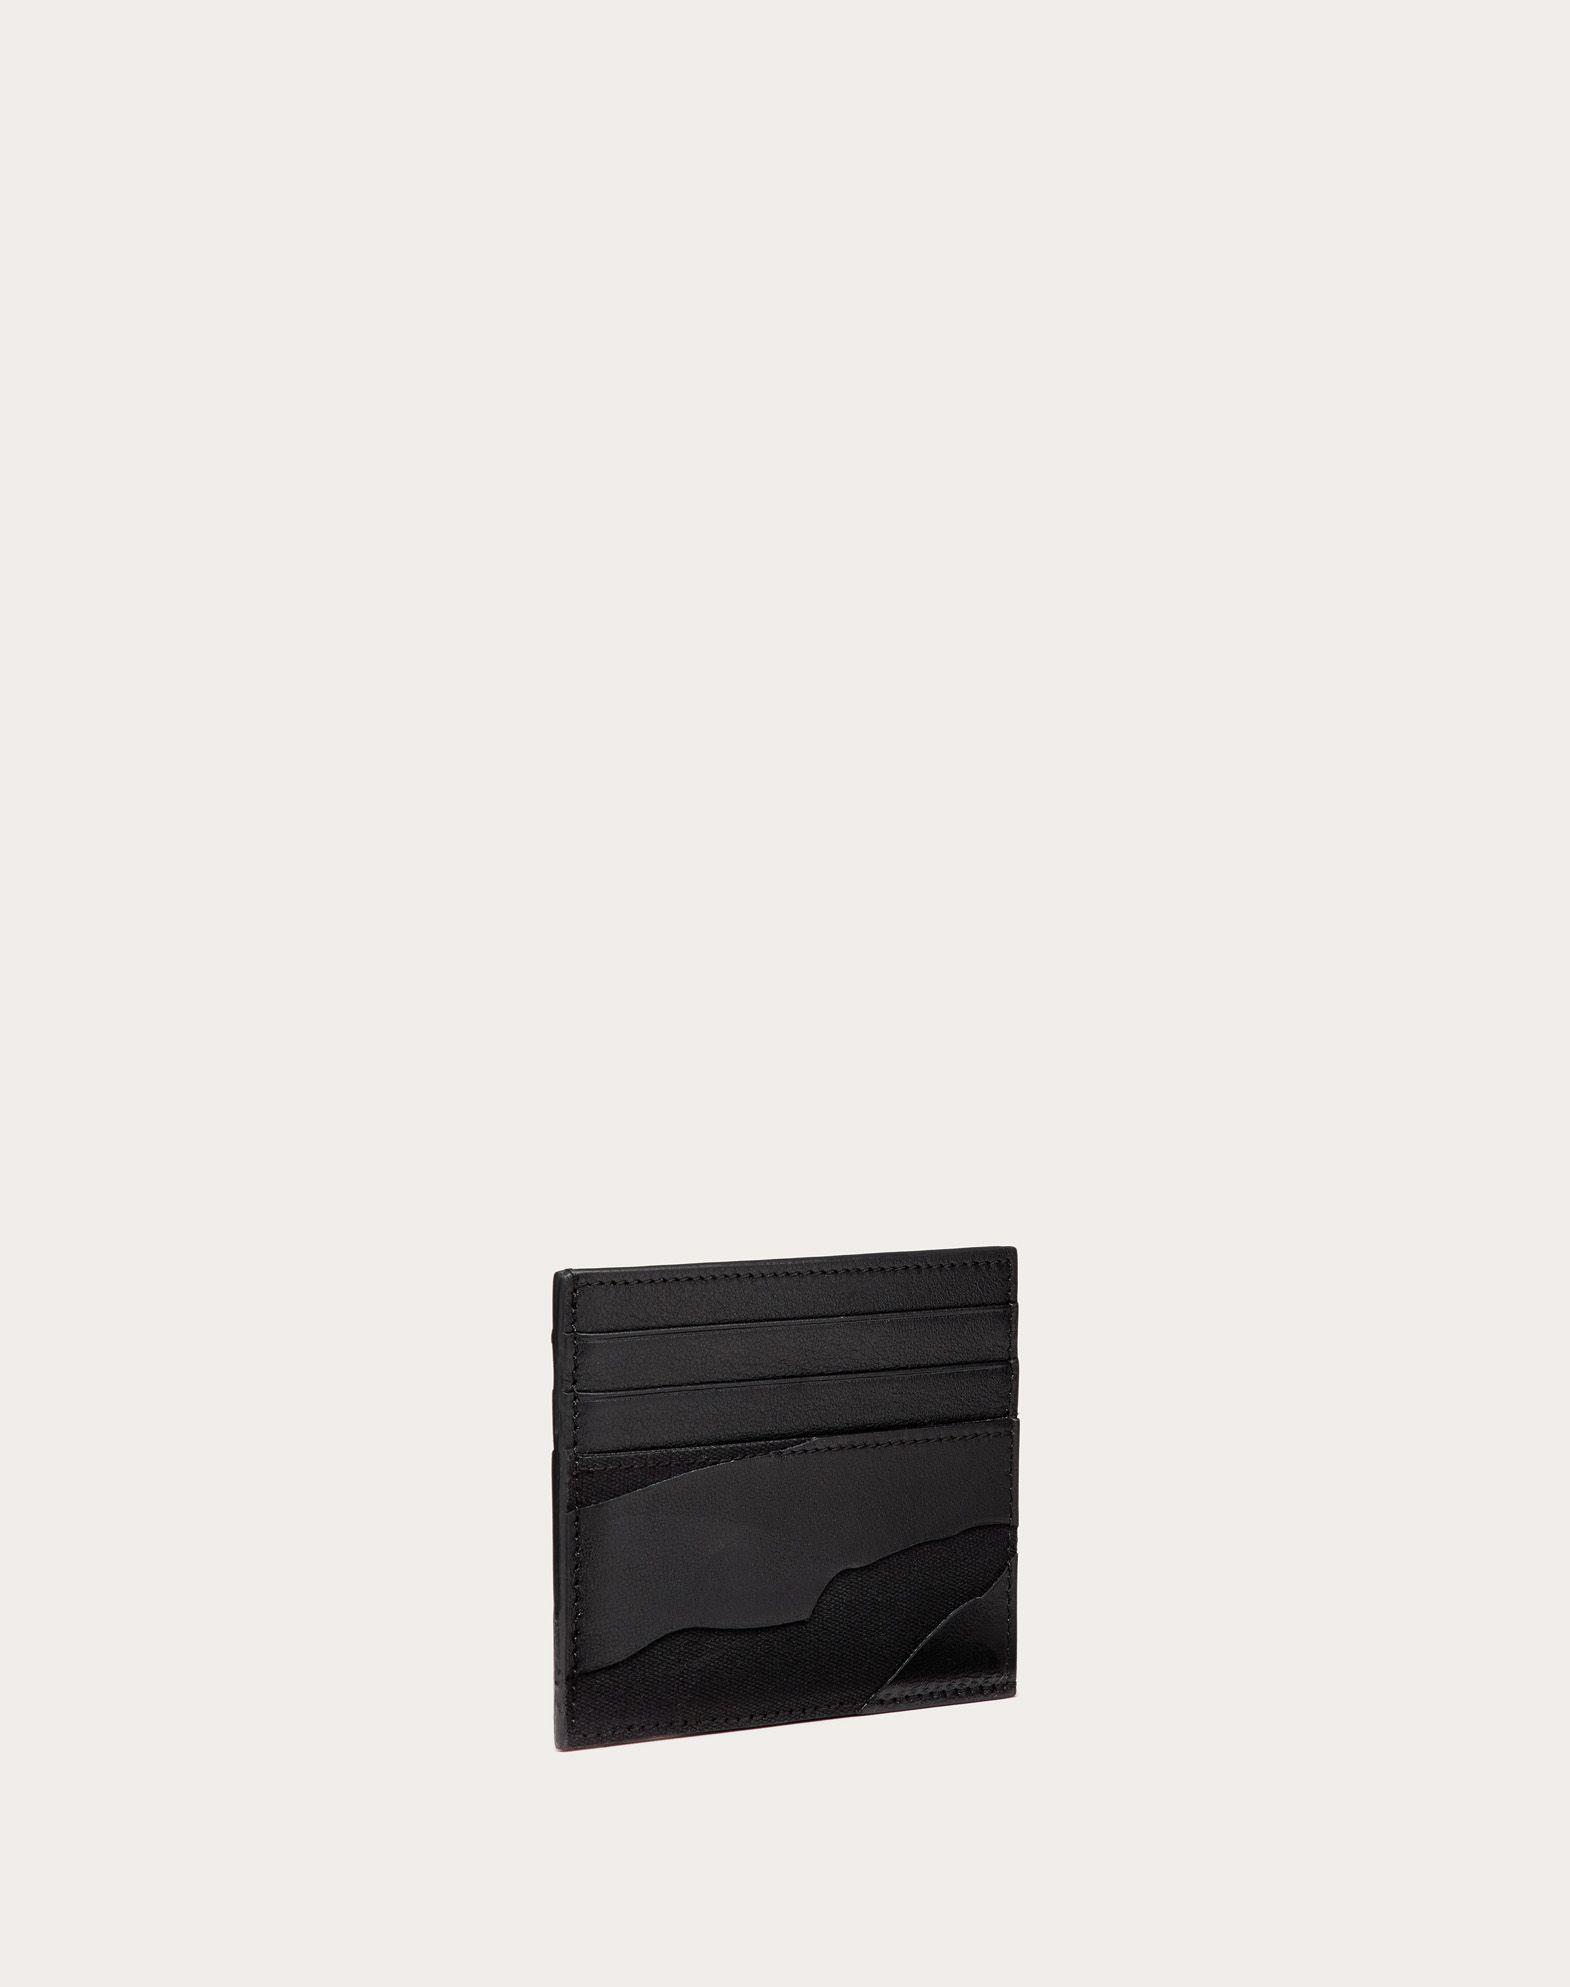 VALENTINO GARAVANI UOMO Camouflage Noir Cardholder  COIN PURSES & CARD CASES U e